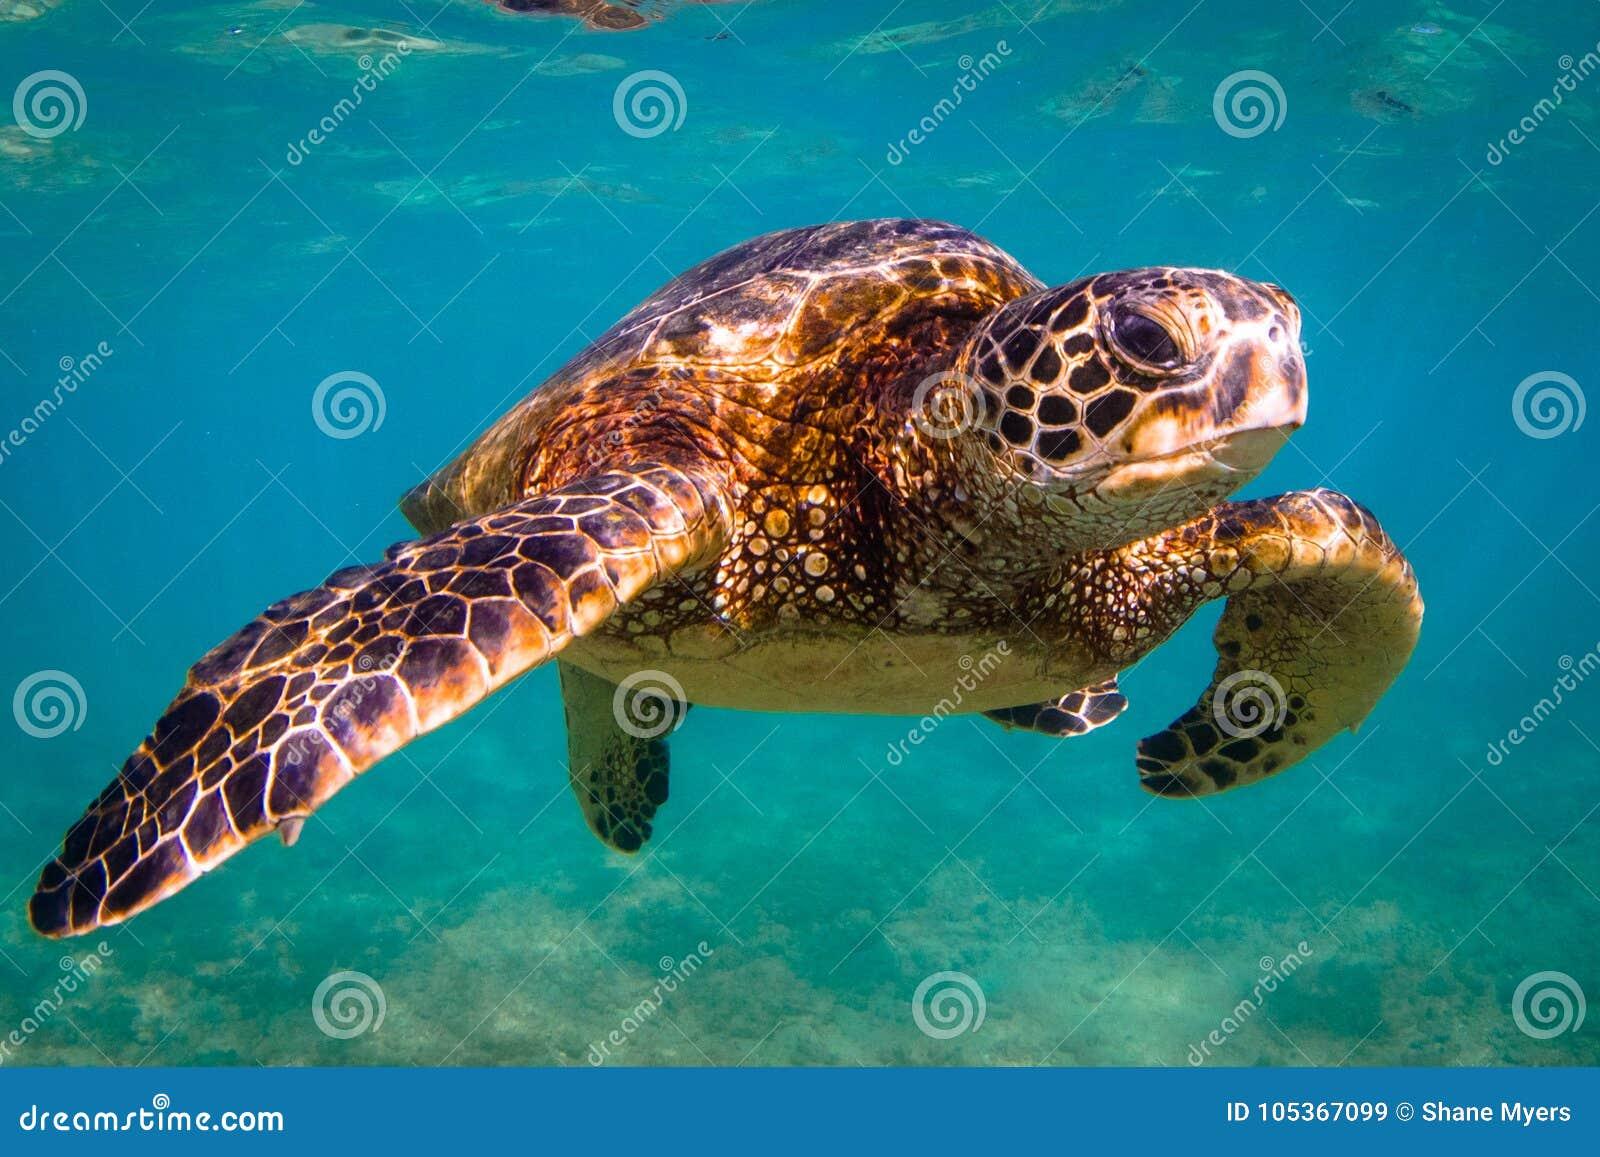 Hawaiian Green Sea Turtle cruising in the warm waters of the Pacific Ocean